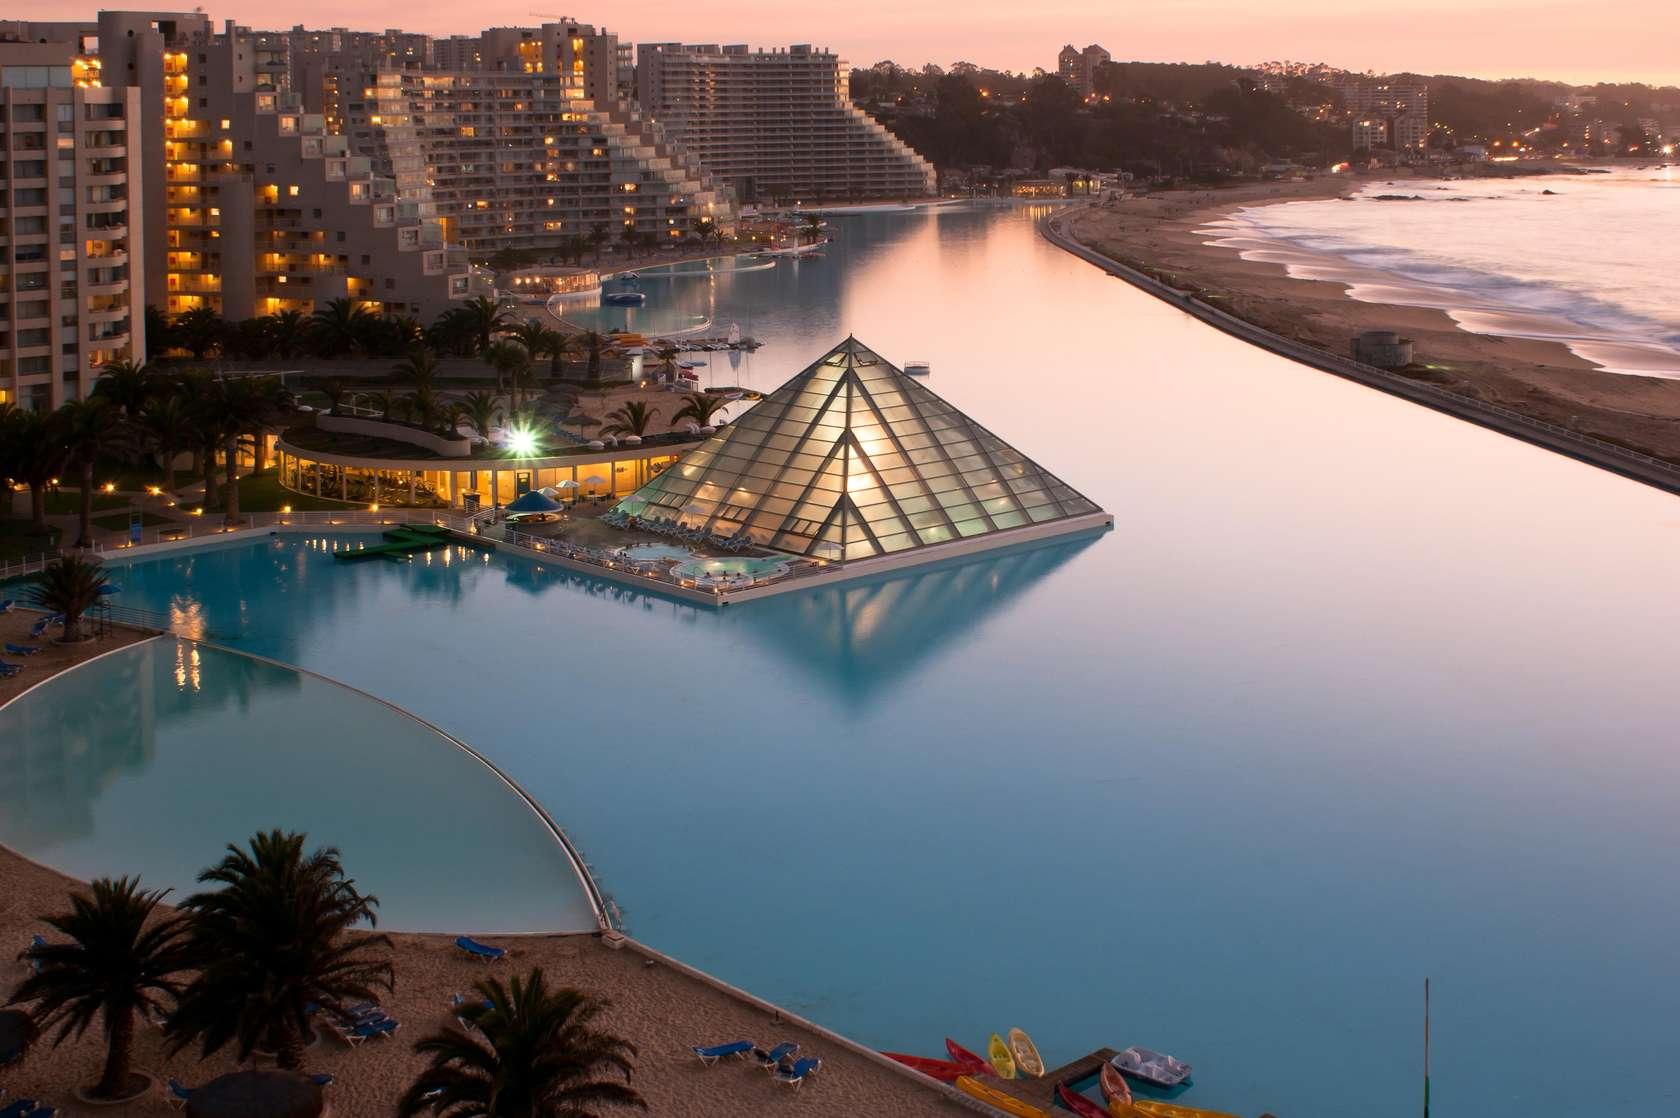 la plus grande piscine vacances du monde. Black Bedroom Furniture Sets. Home Design Ideas